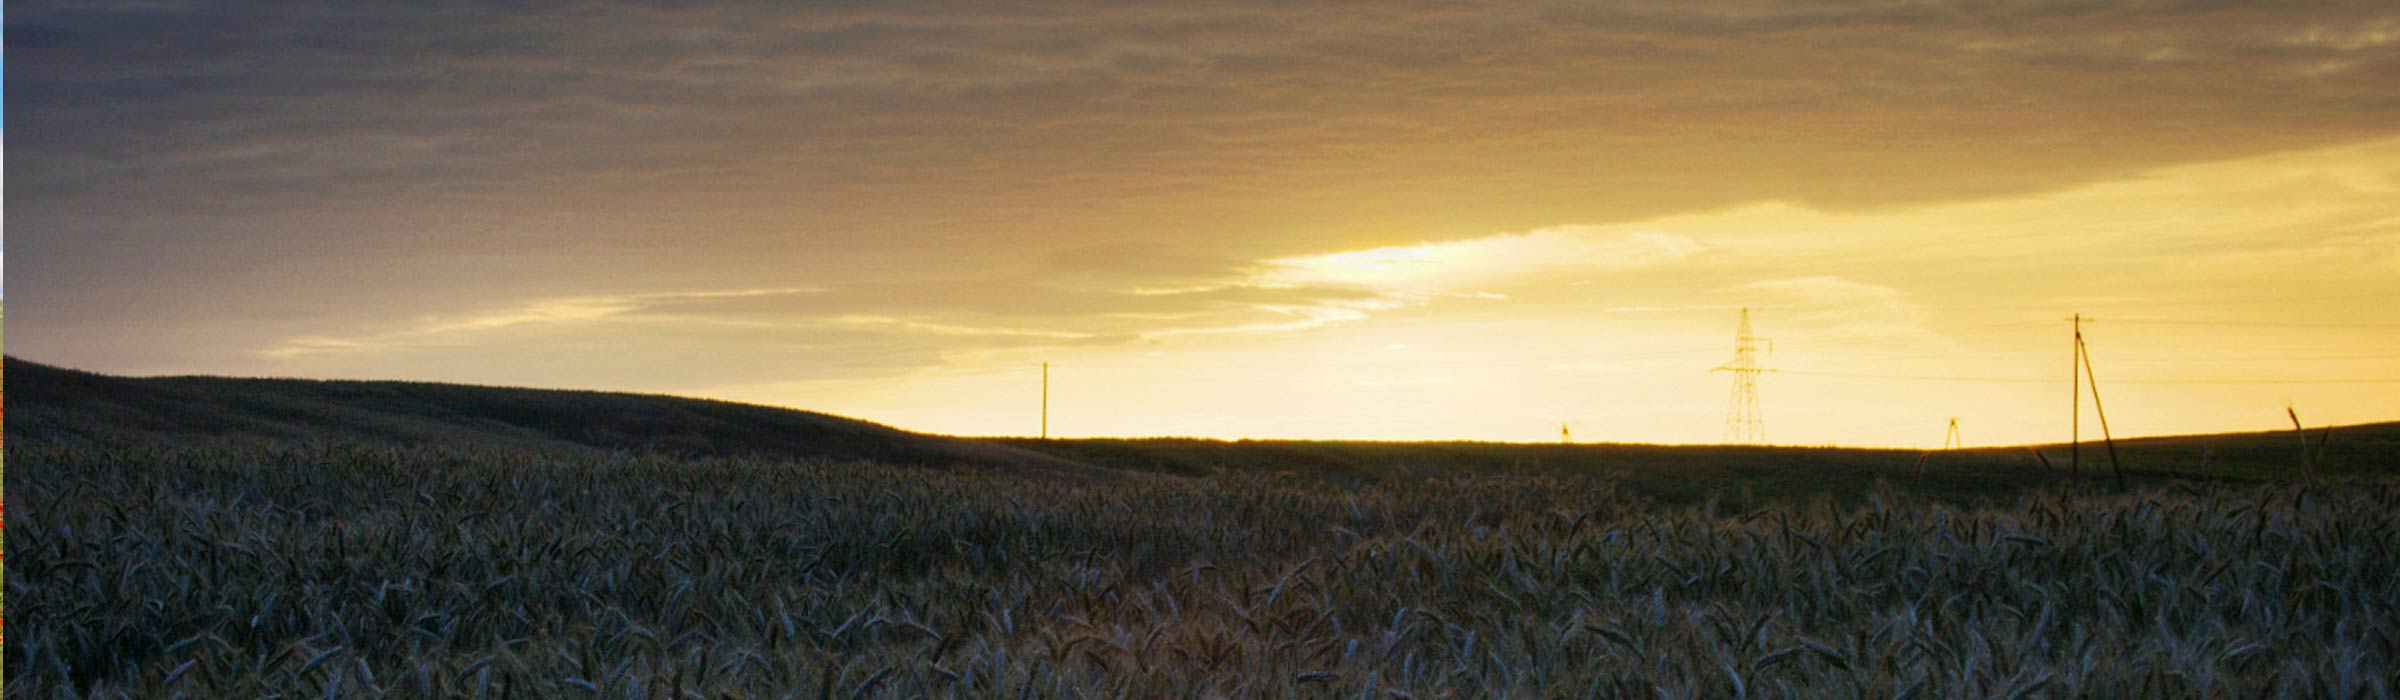 Baner: Zachód słońca